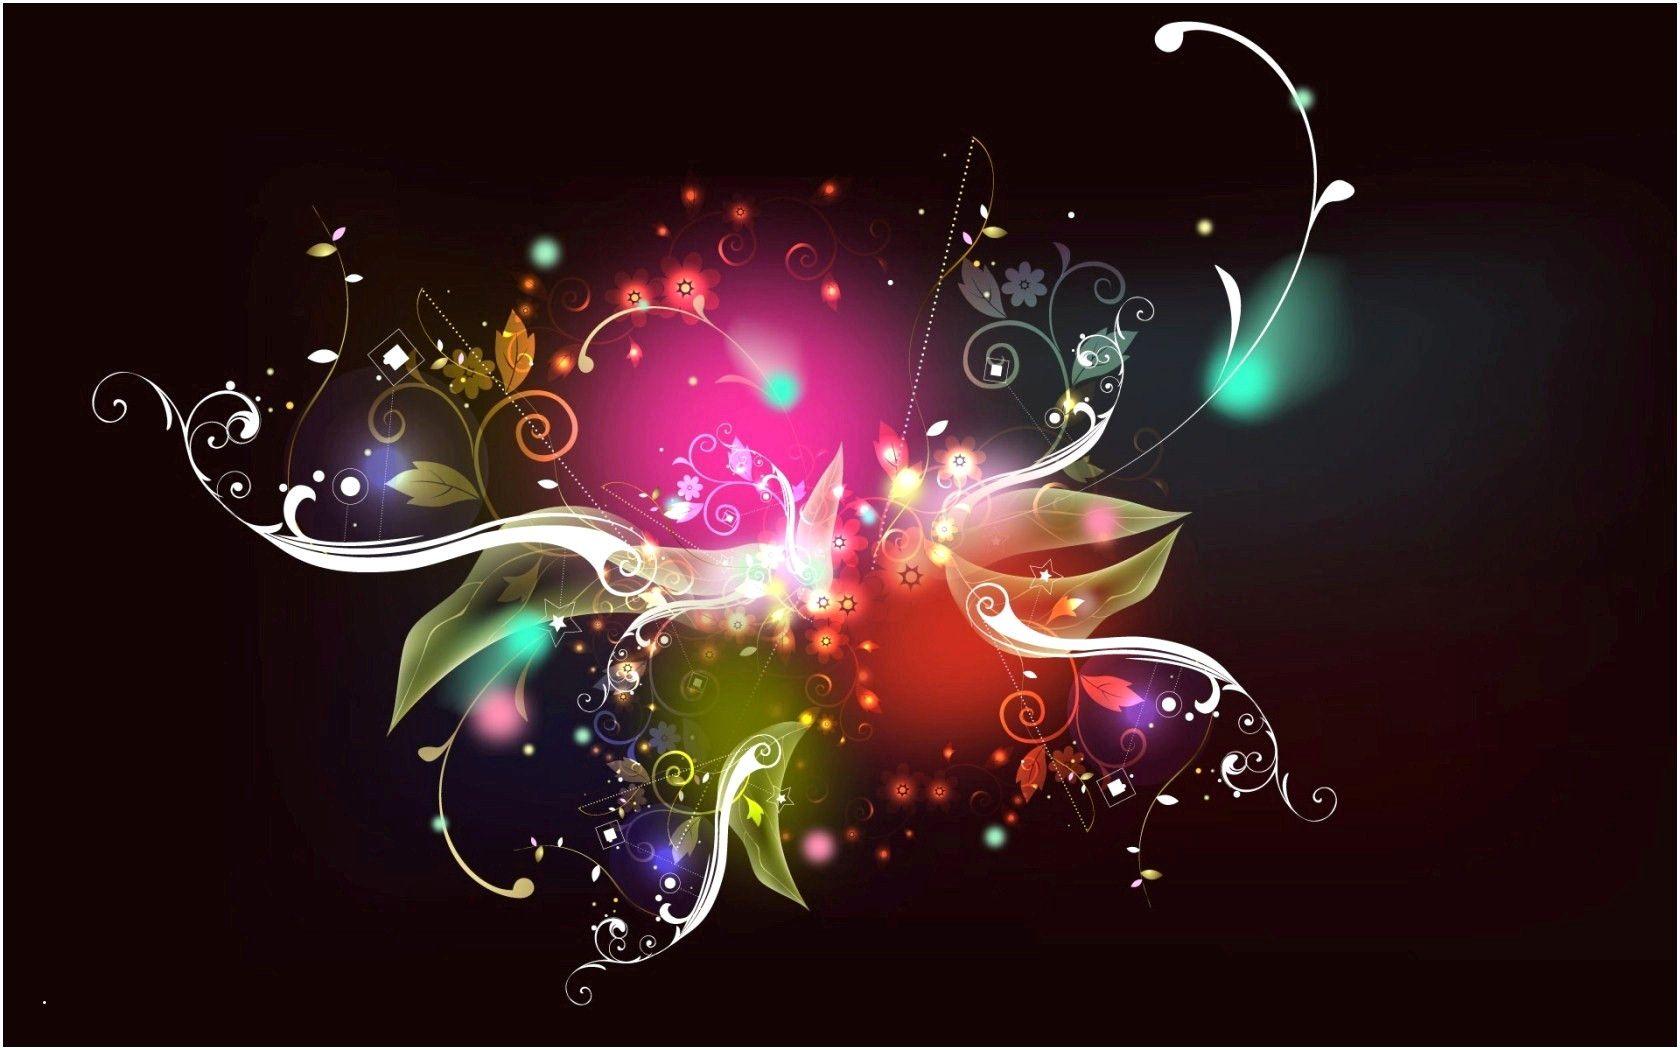 Fresh Www 3d Wallpaper Hd Com Background Hd Wallpaper Android Wallpaper Art Wallpaper